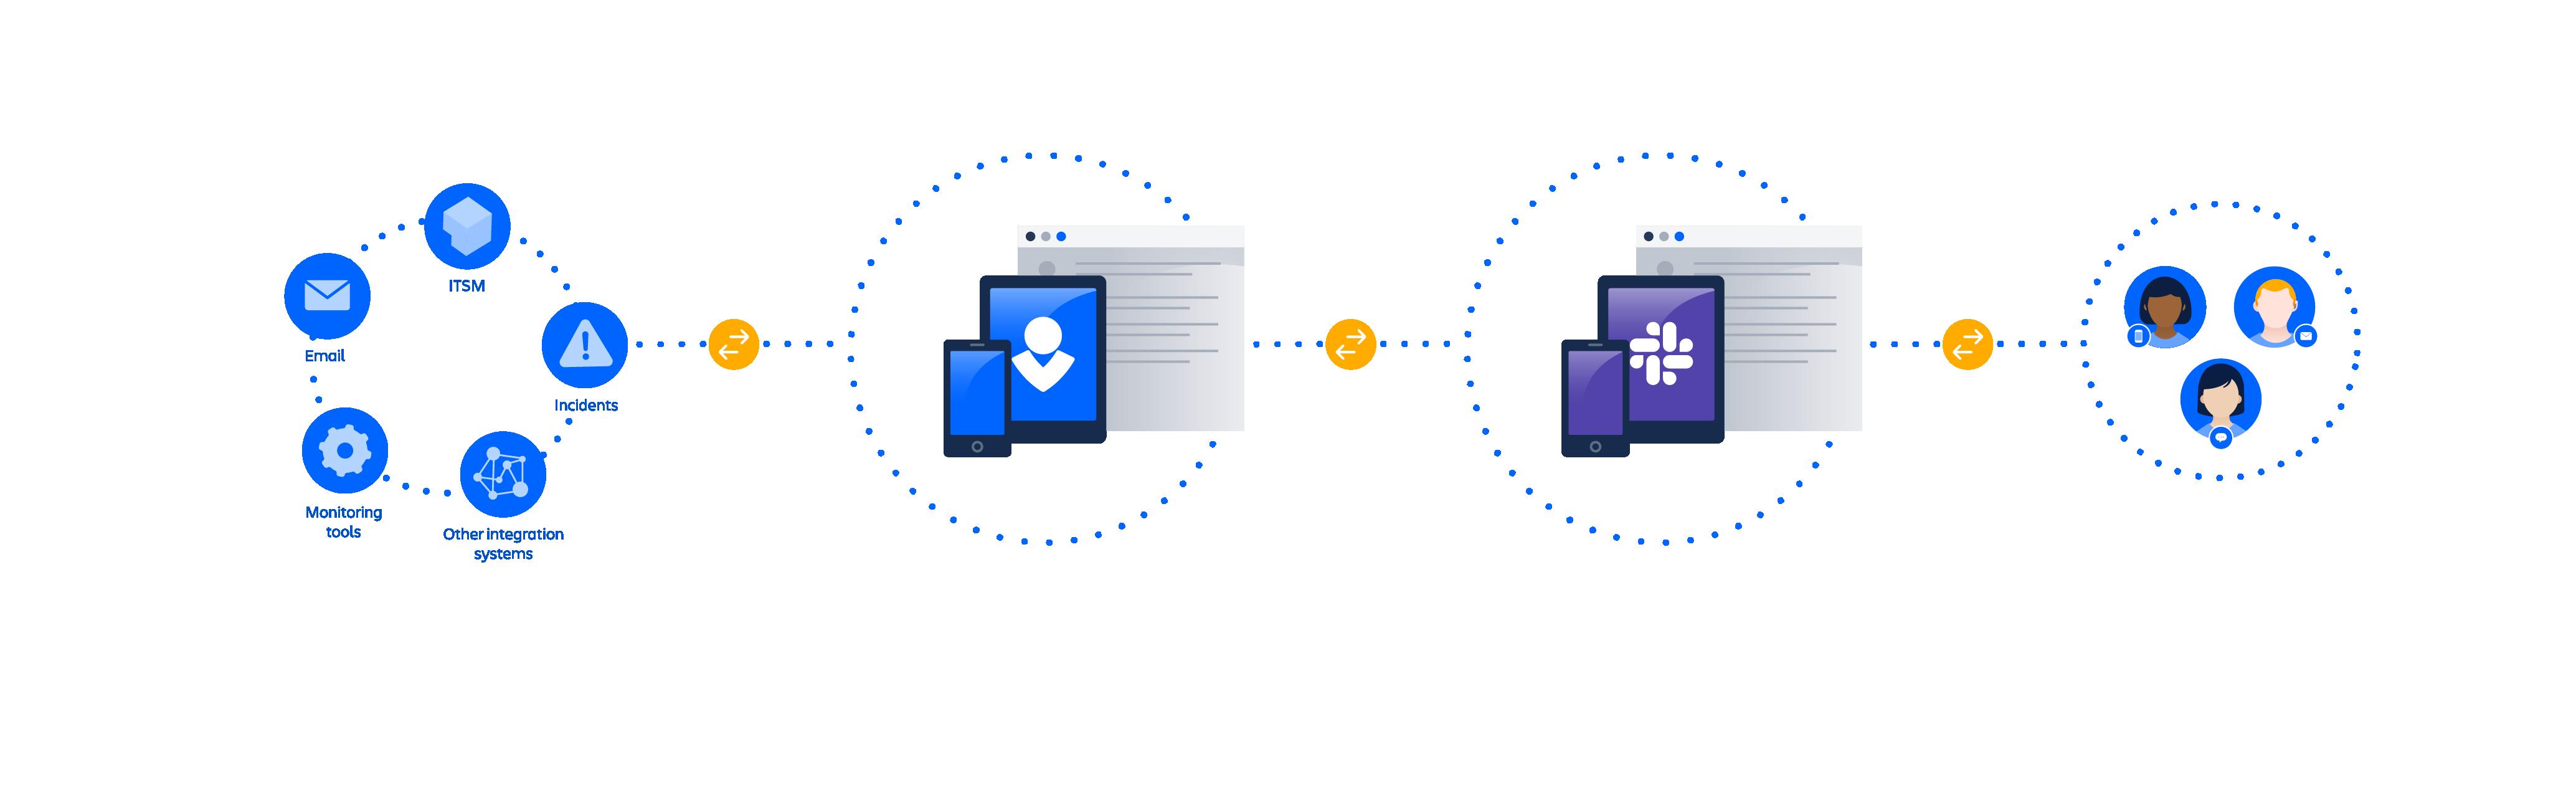 Slack integration diagram